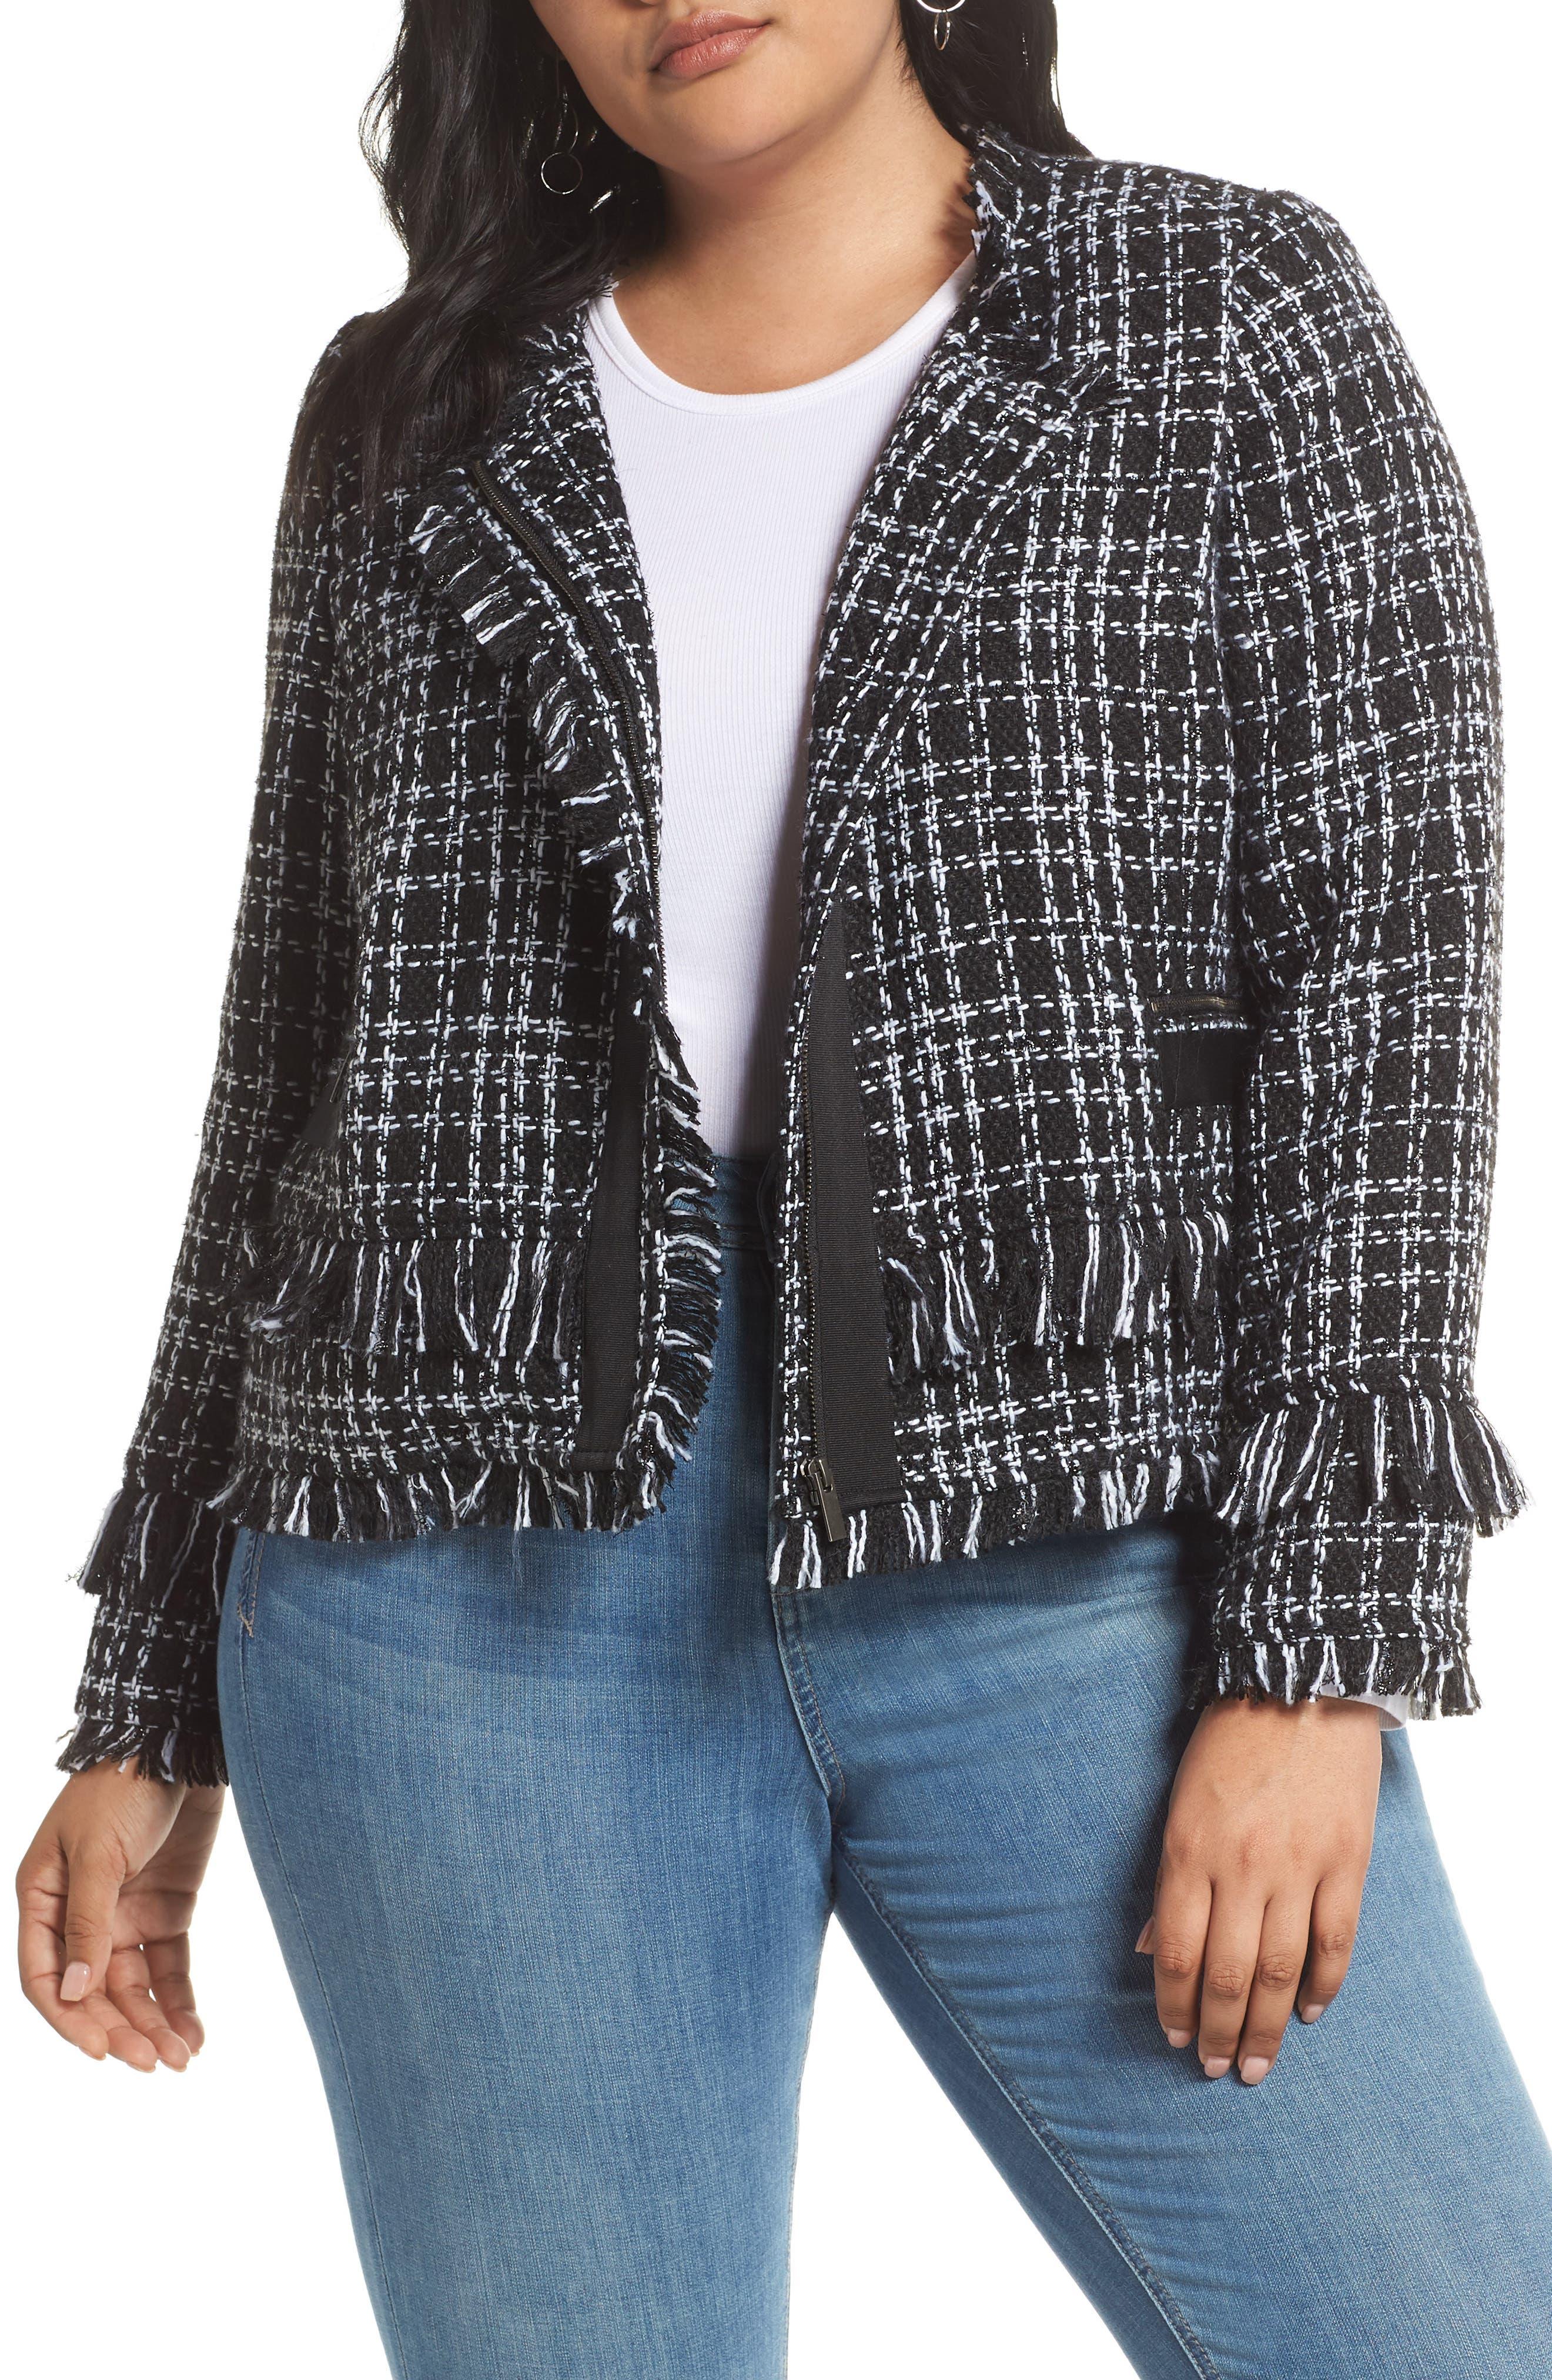 HALOGEN<SUP>®</SUP>, Tweed Fringe Jacket, Main thumbnail 1, color, BLACK- WHITE TWEED